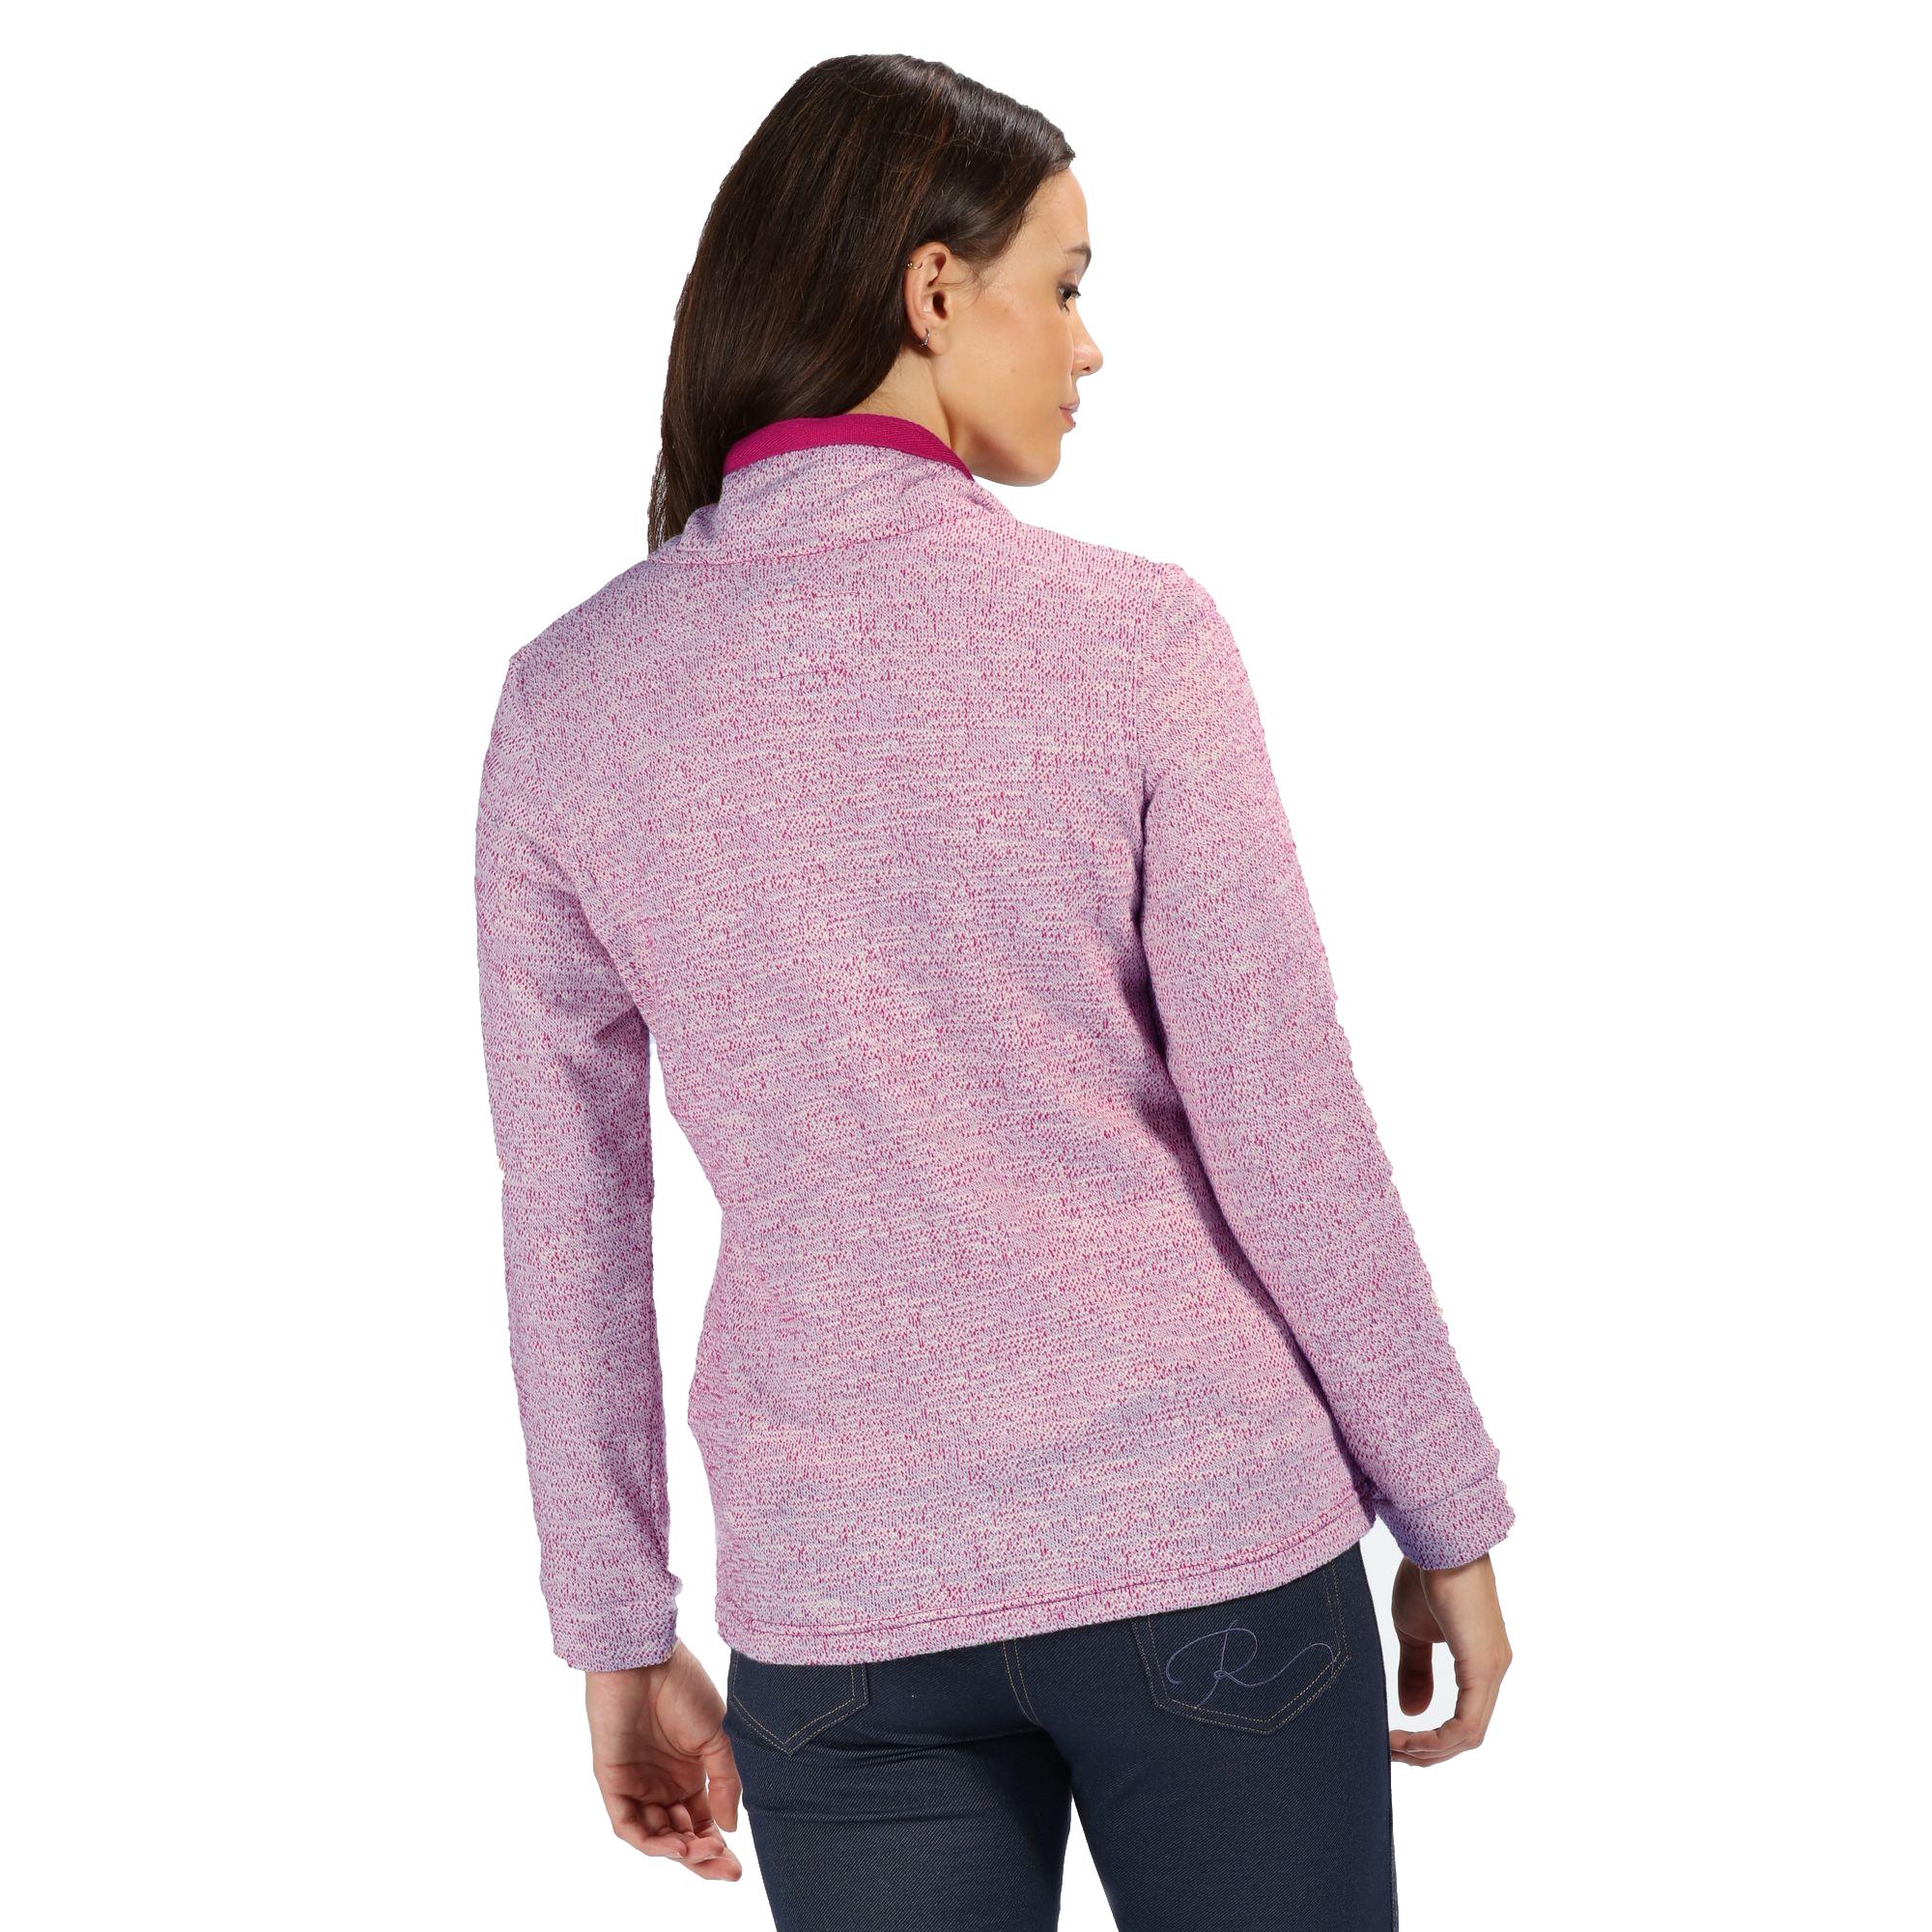 Regatta-Odetta-Womens-Warm-Curved-Full-Zip-Fleece-Jacket-RRP-50 thumbnail 19